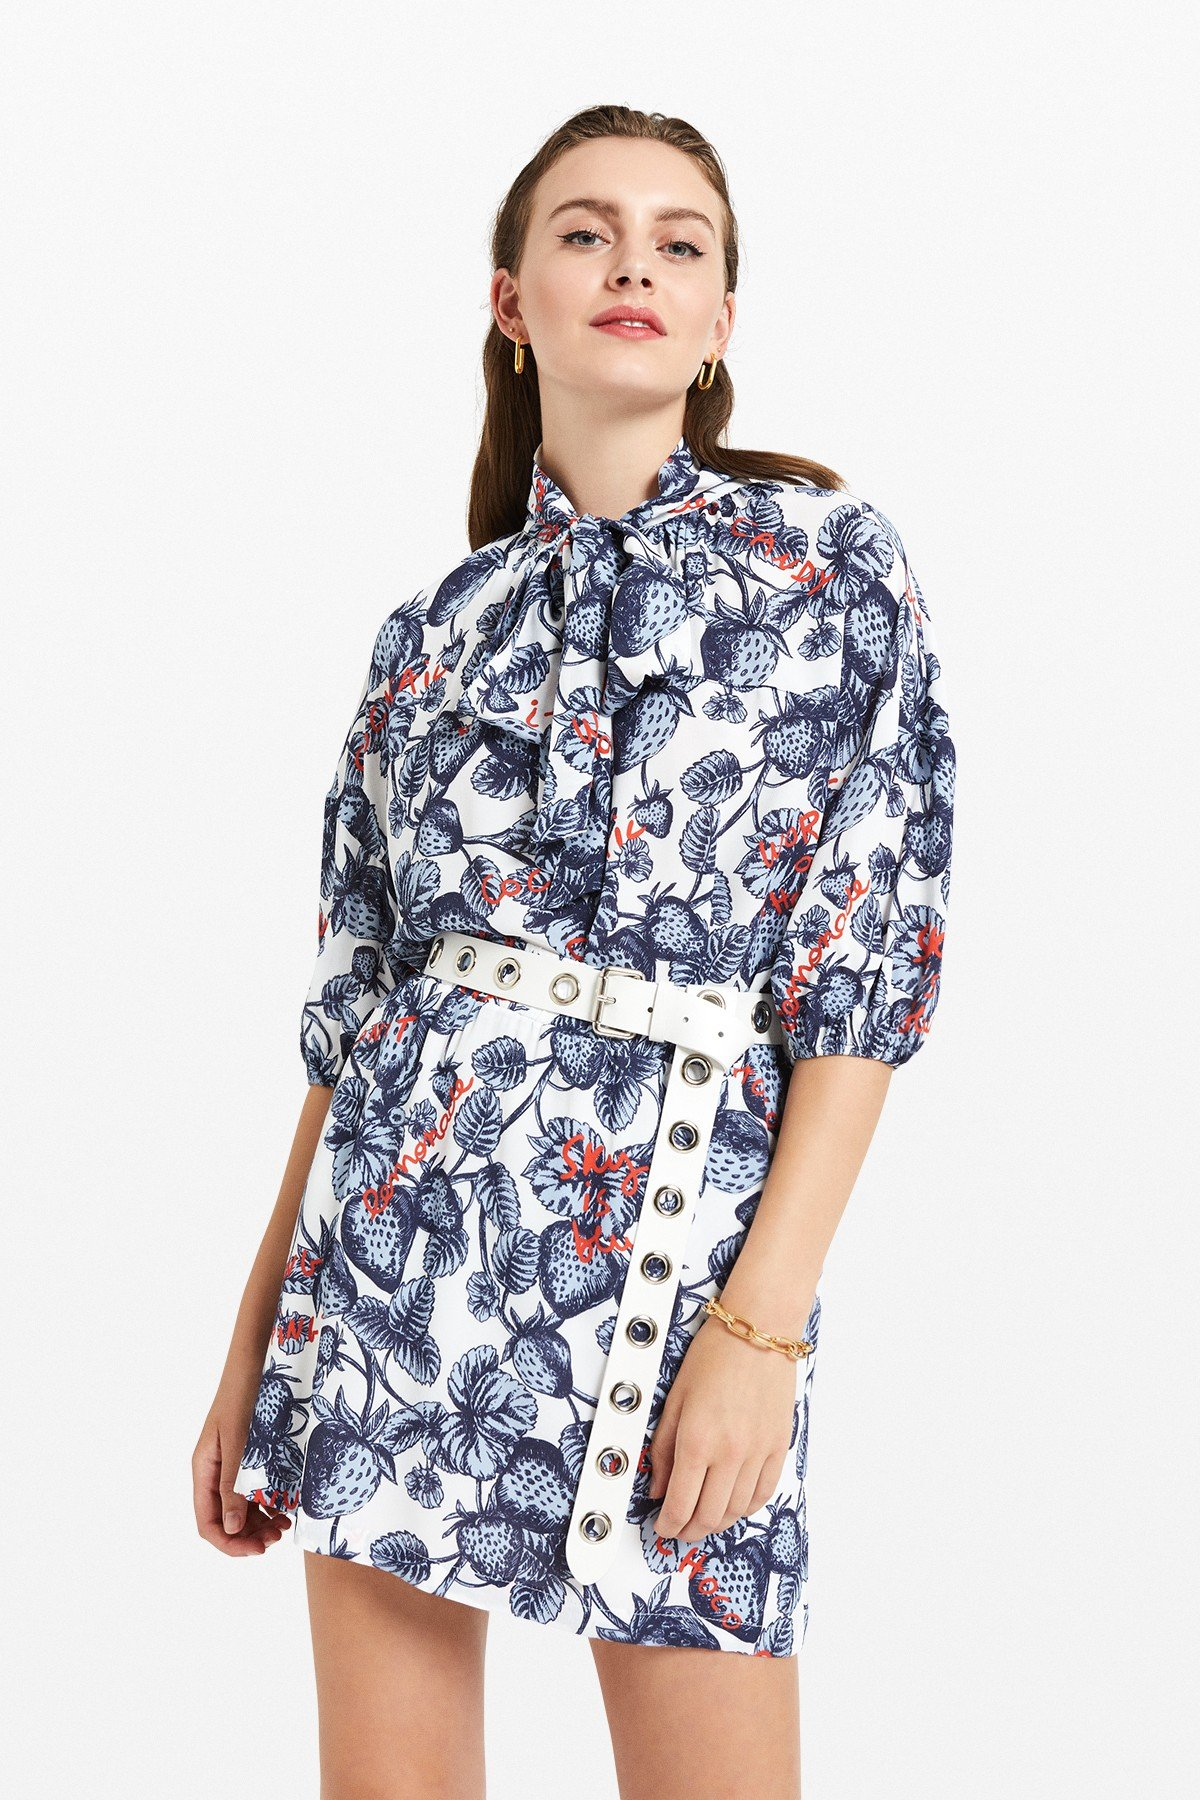 Viscose shirt with 'Strawberry' print